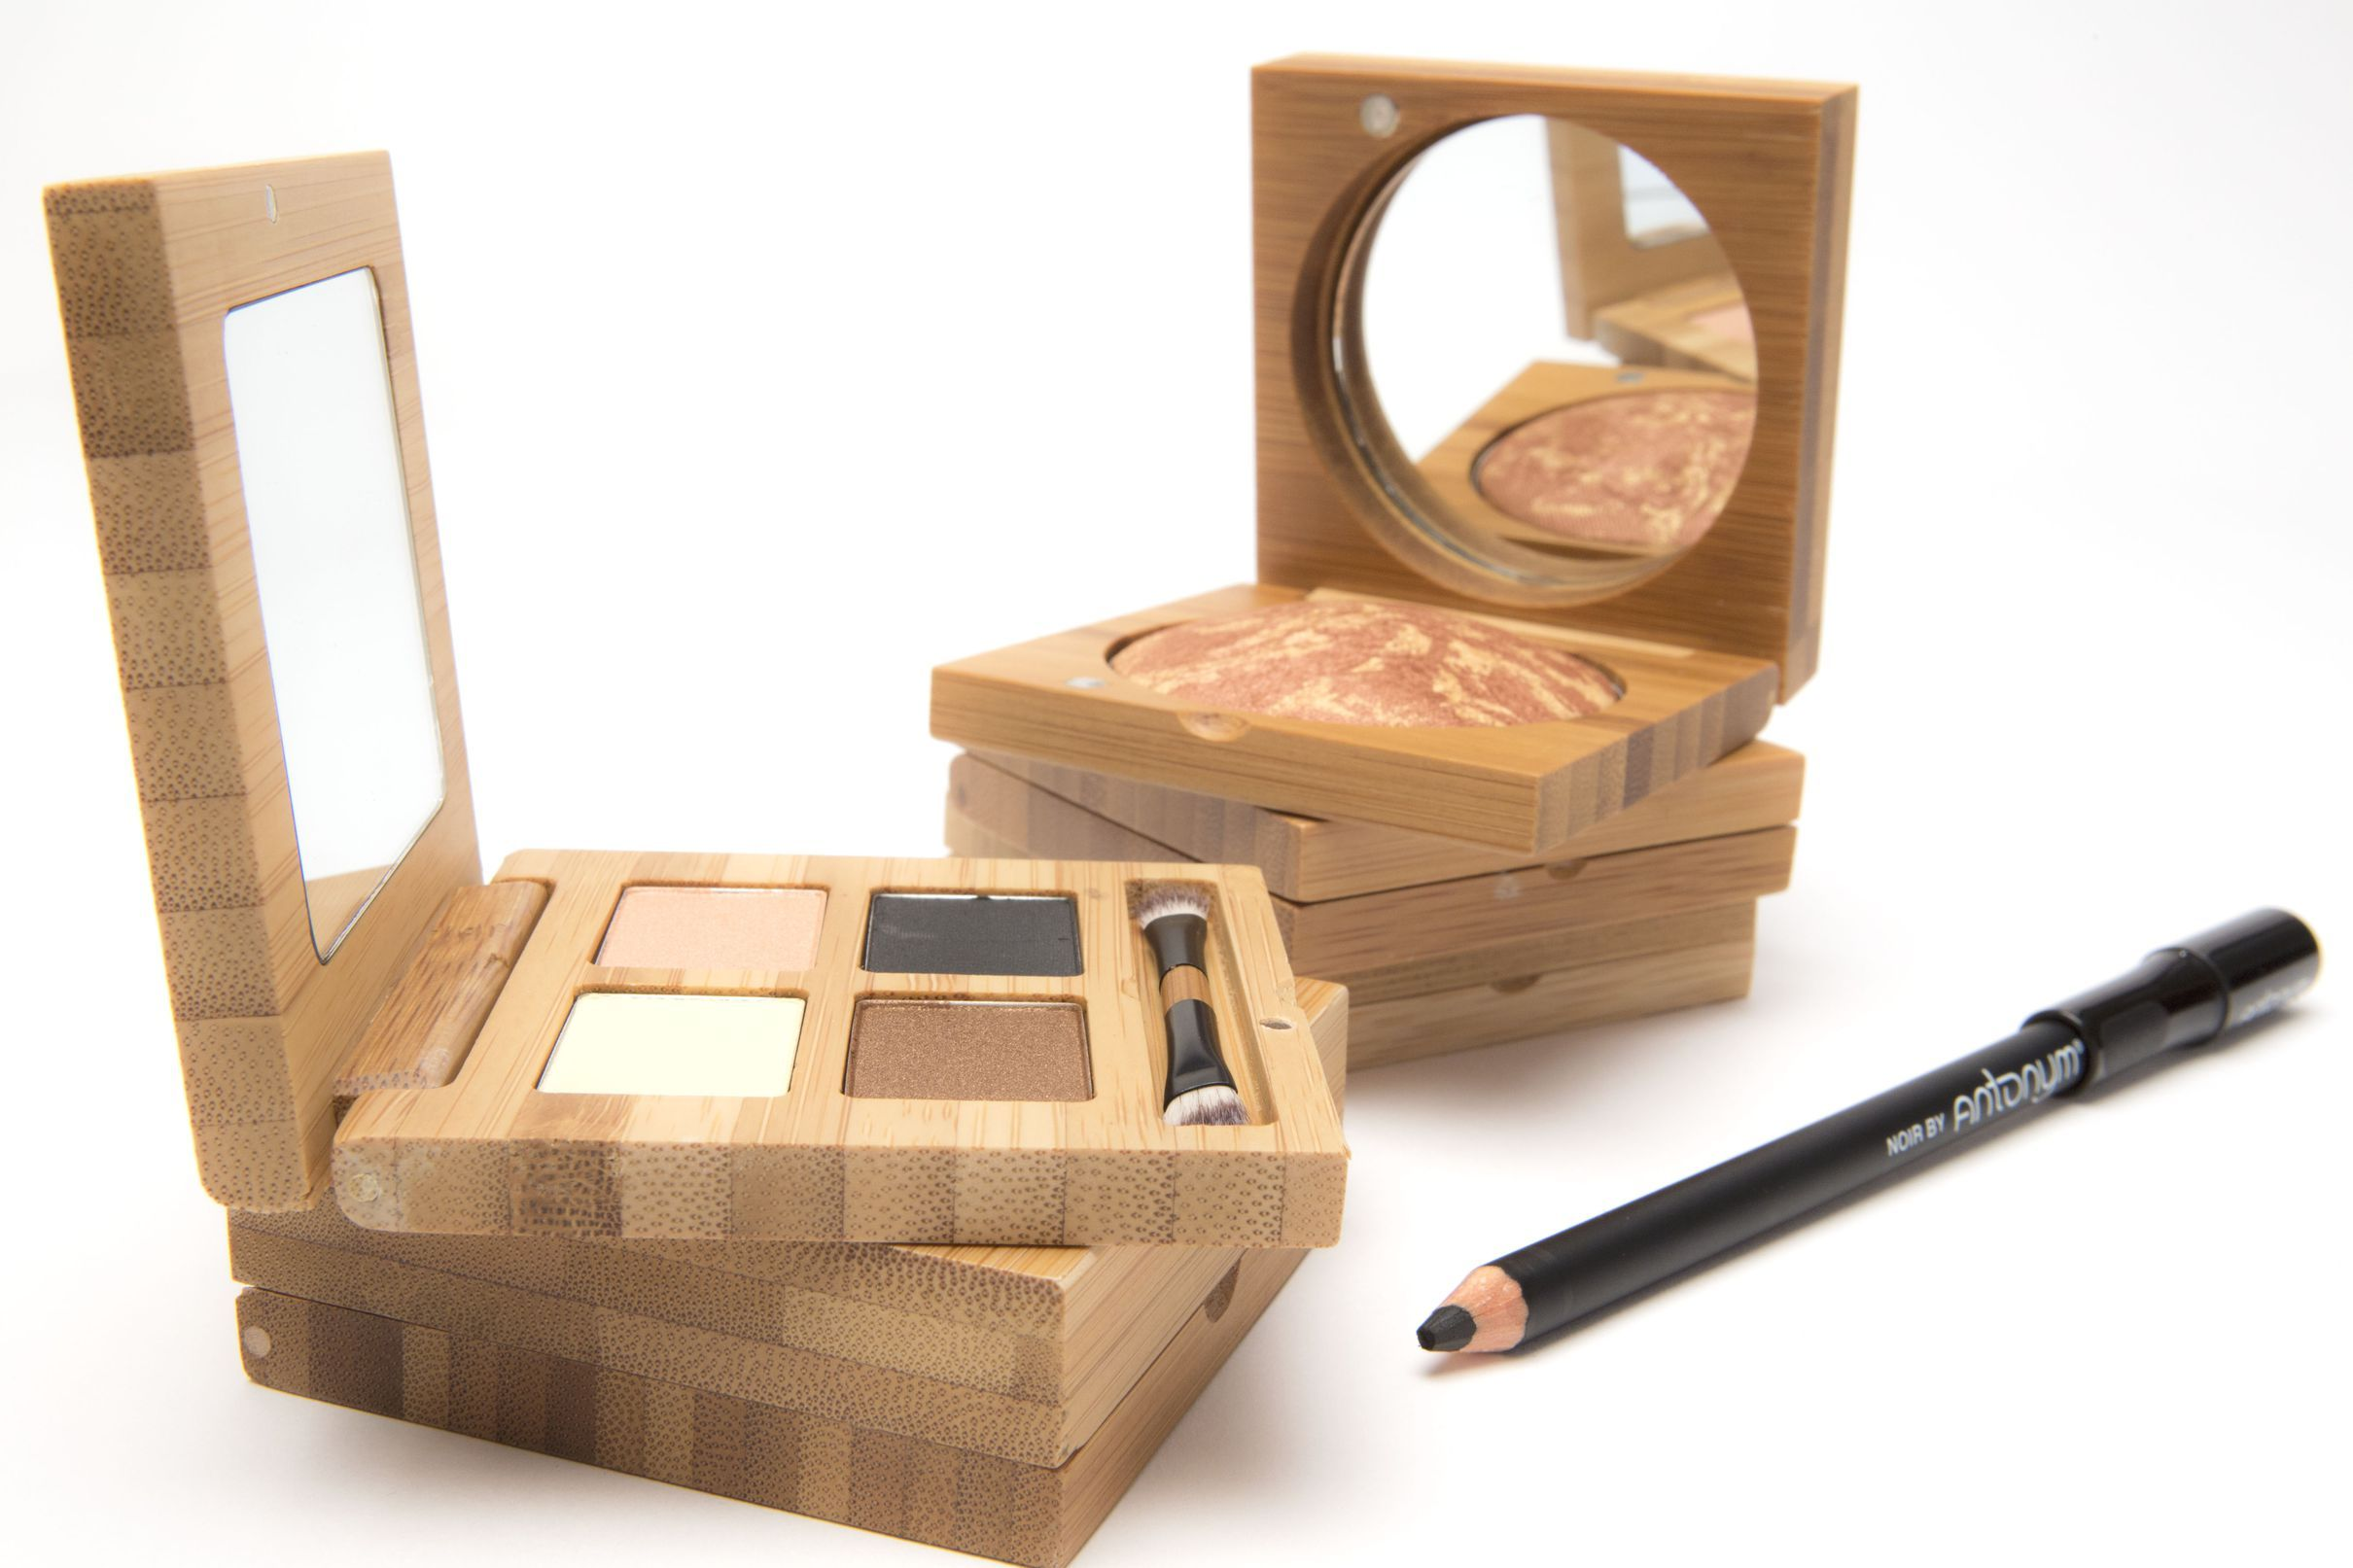 'Natural' Makeup Brand Antonym Launches at